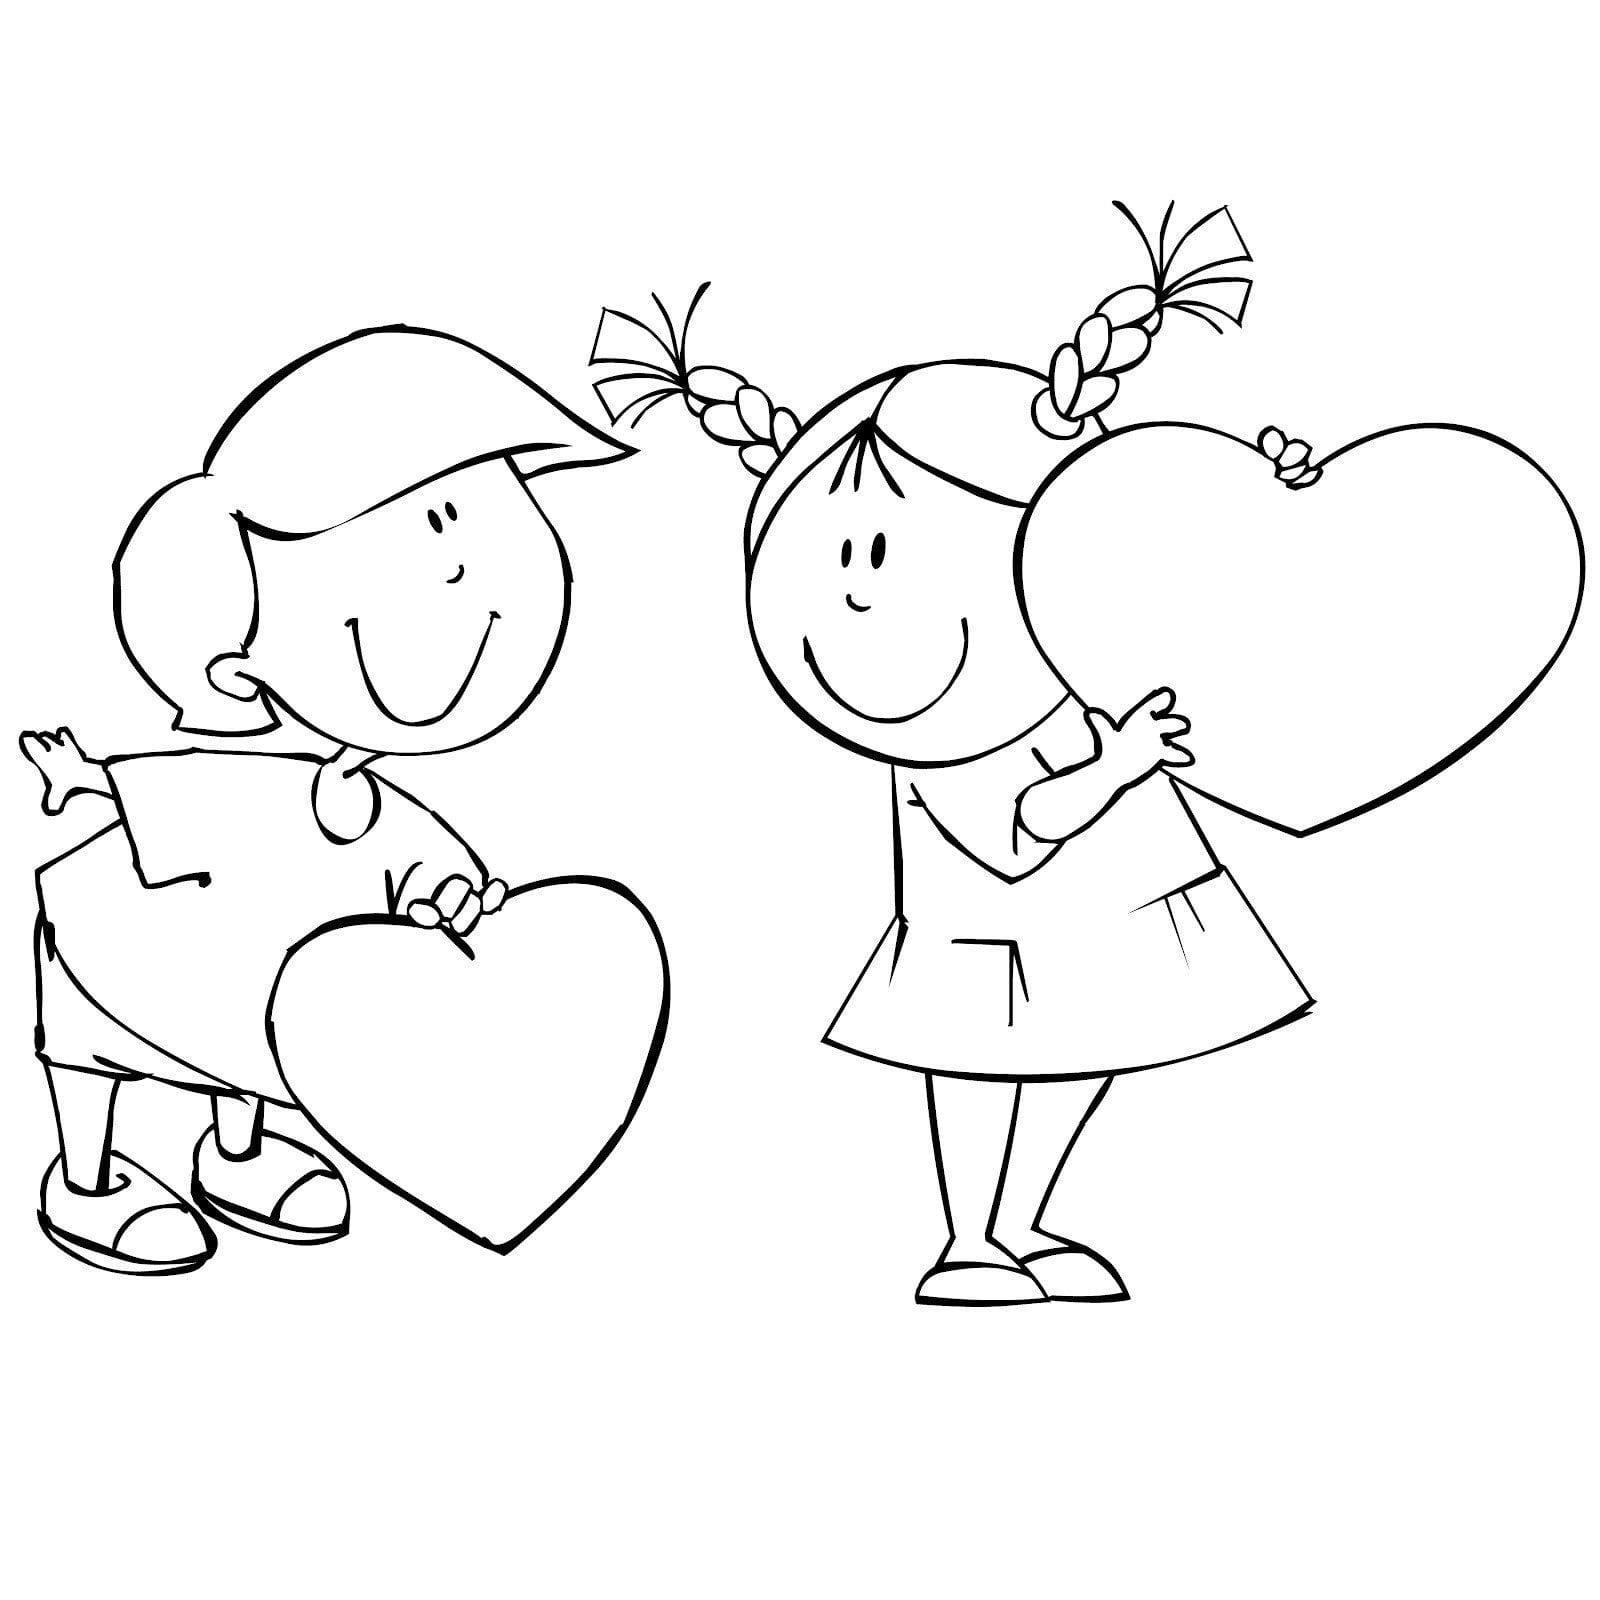 den-besplatno-raskraski-valentinov день бесплатно раскраски валентинов